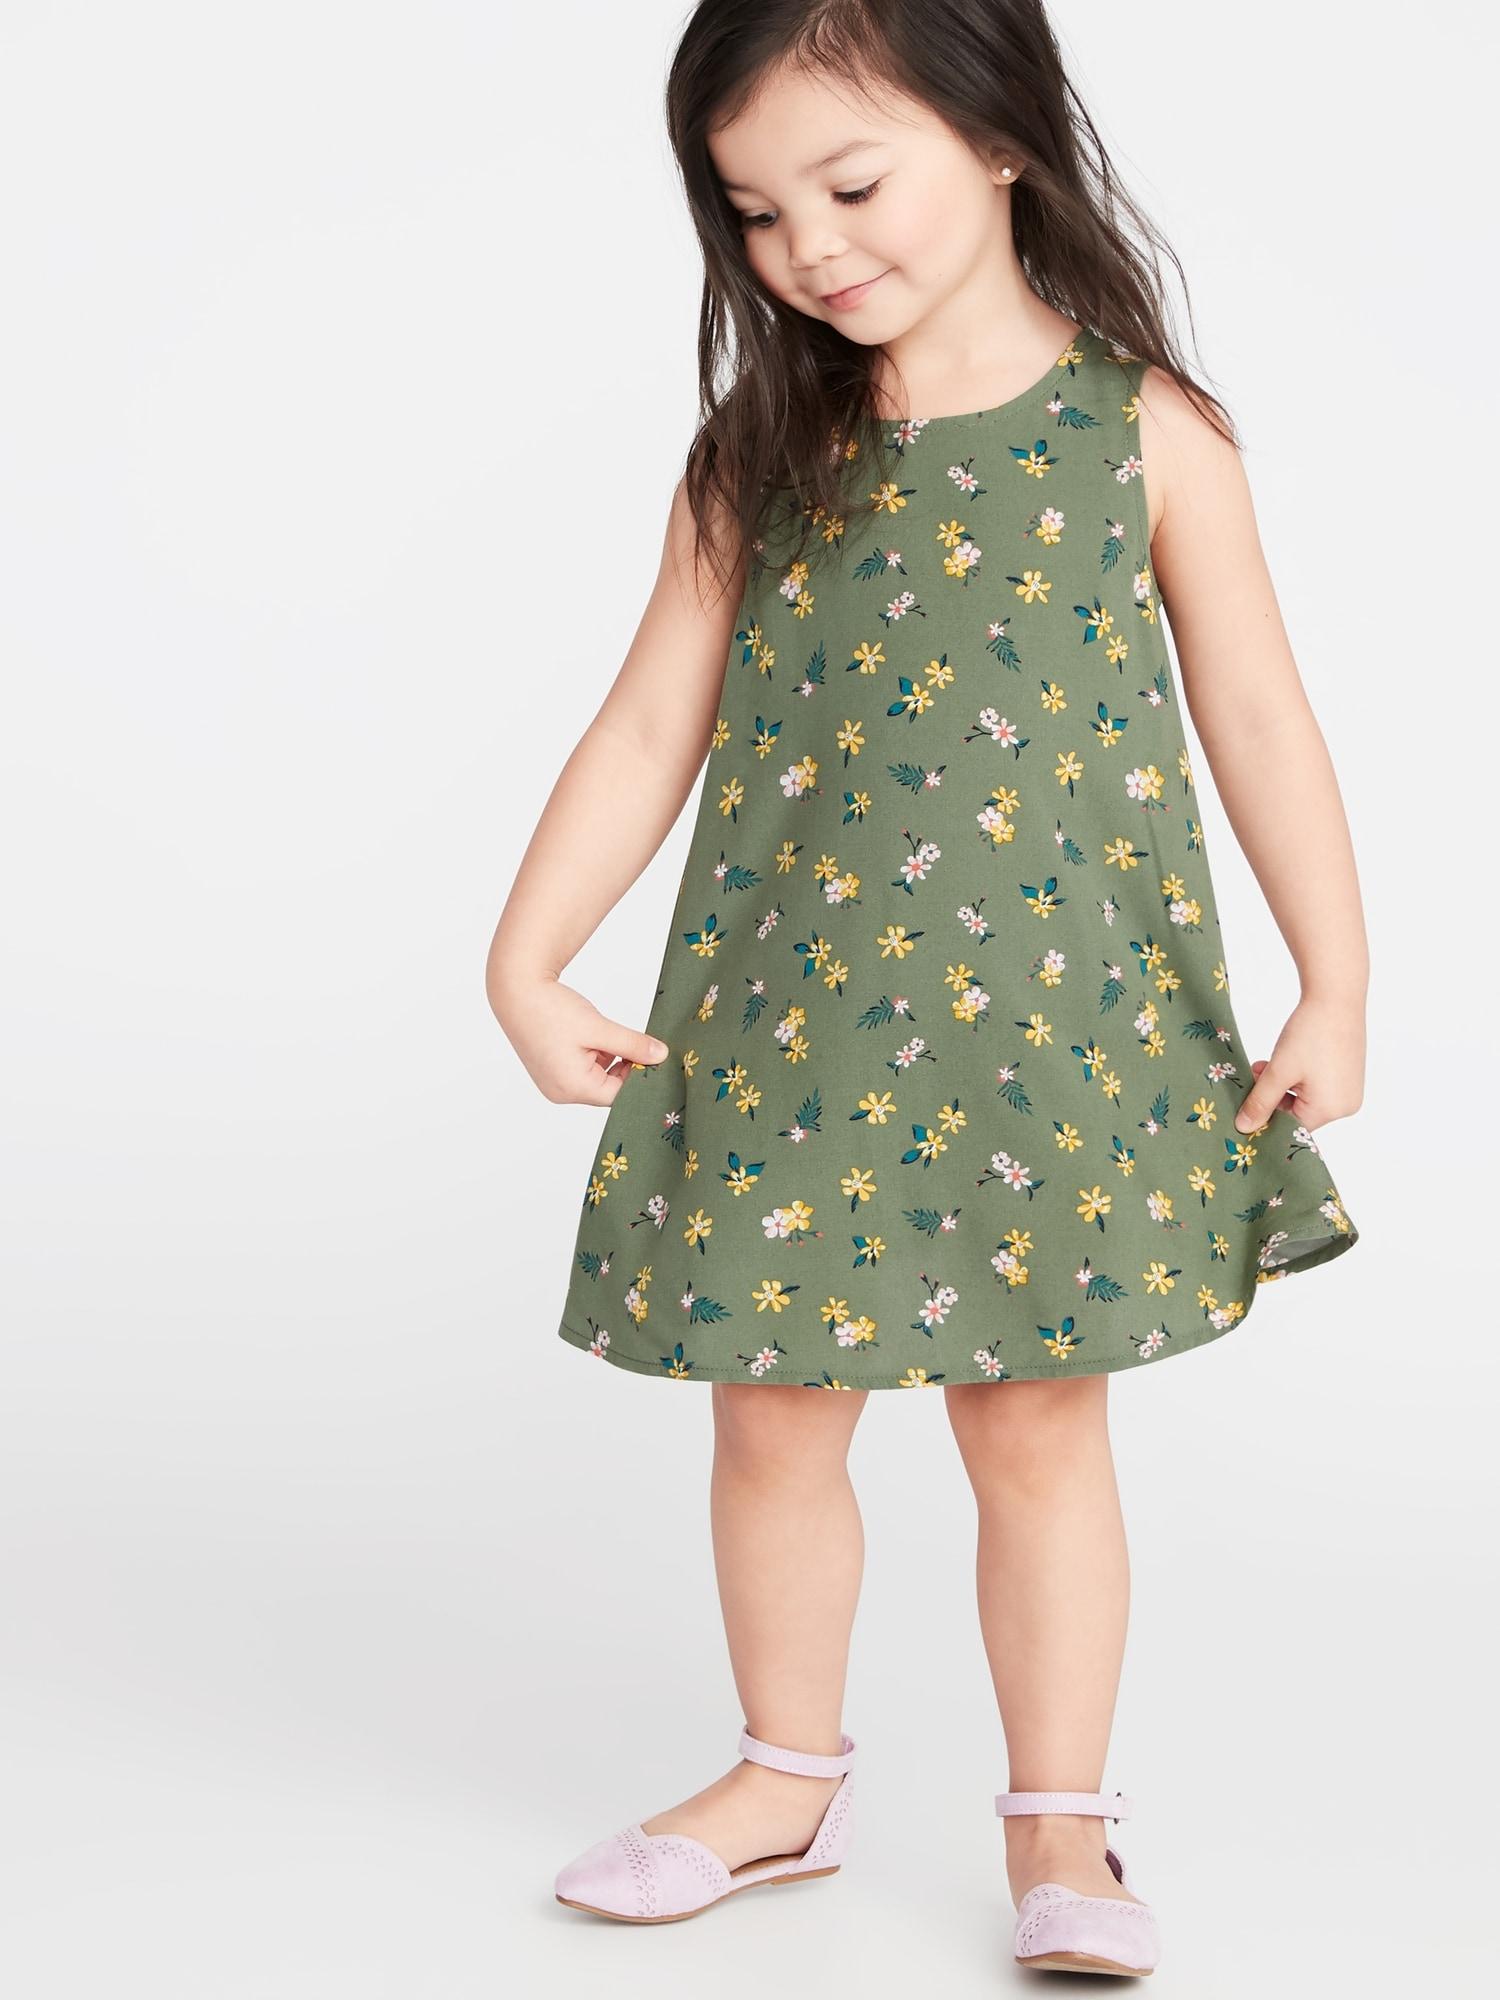 2586c4bfec830 Printed Sleeveless Swing Dress for Toddler Girls   Old Navy